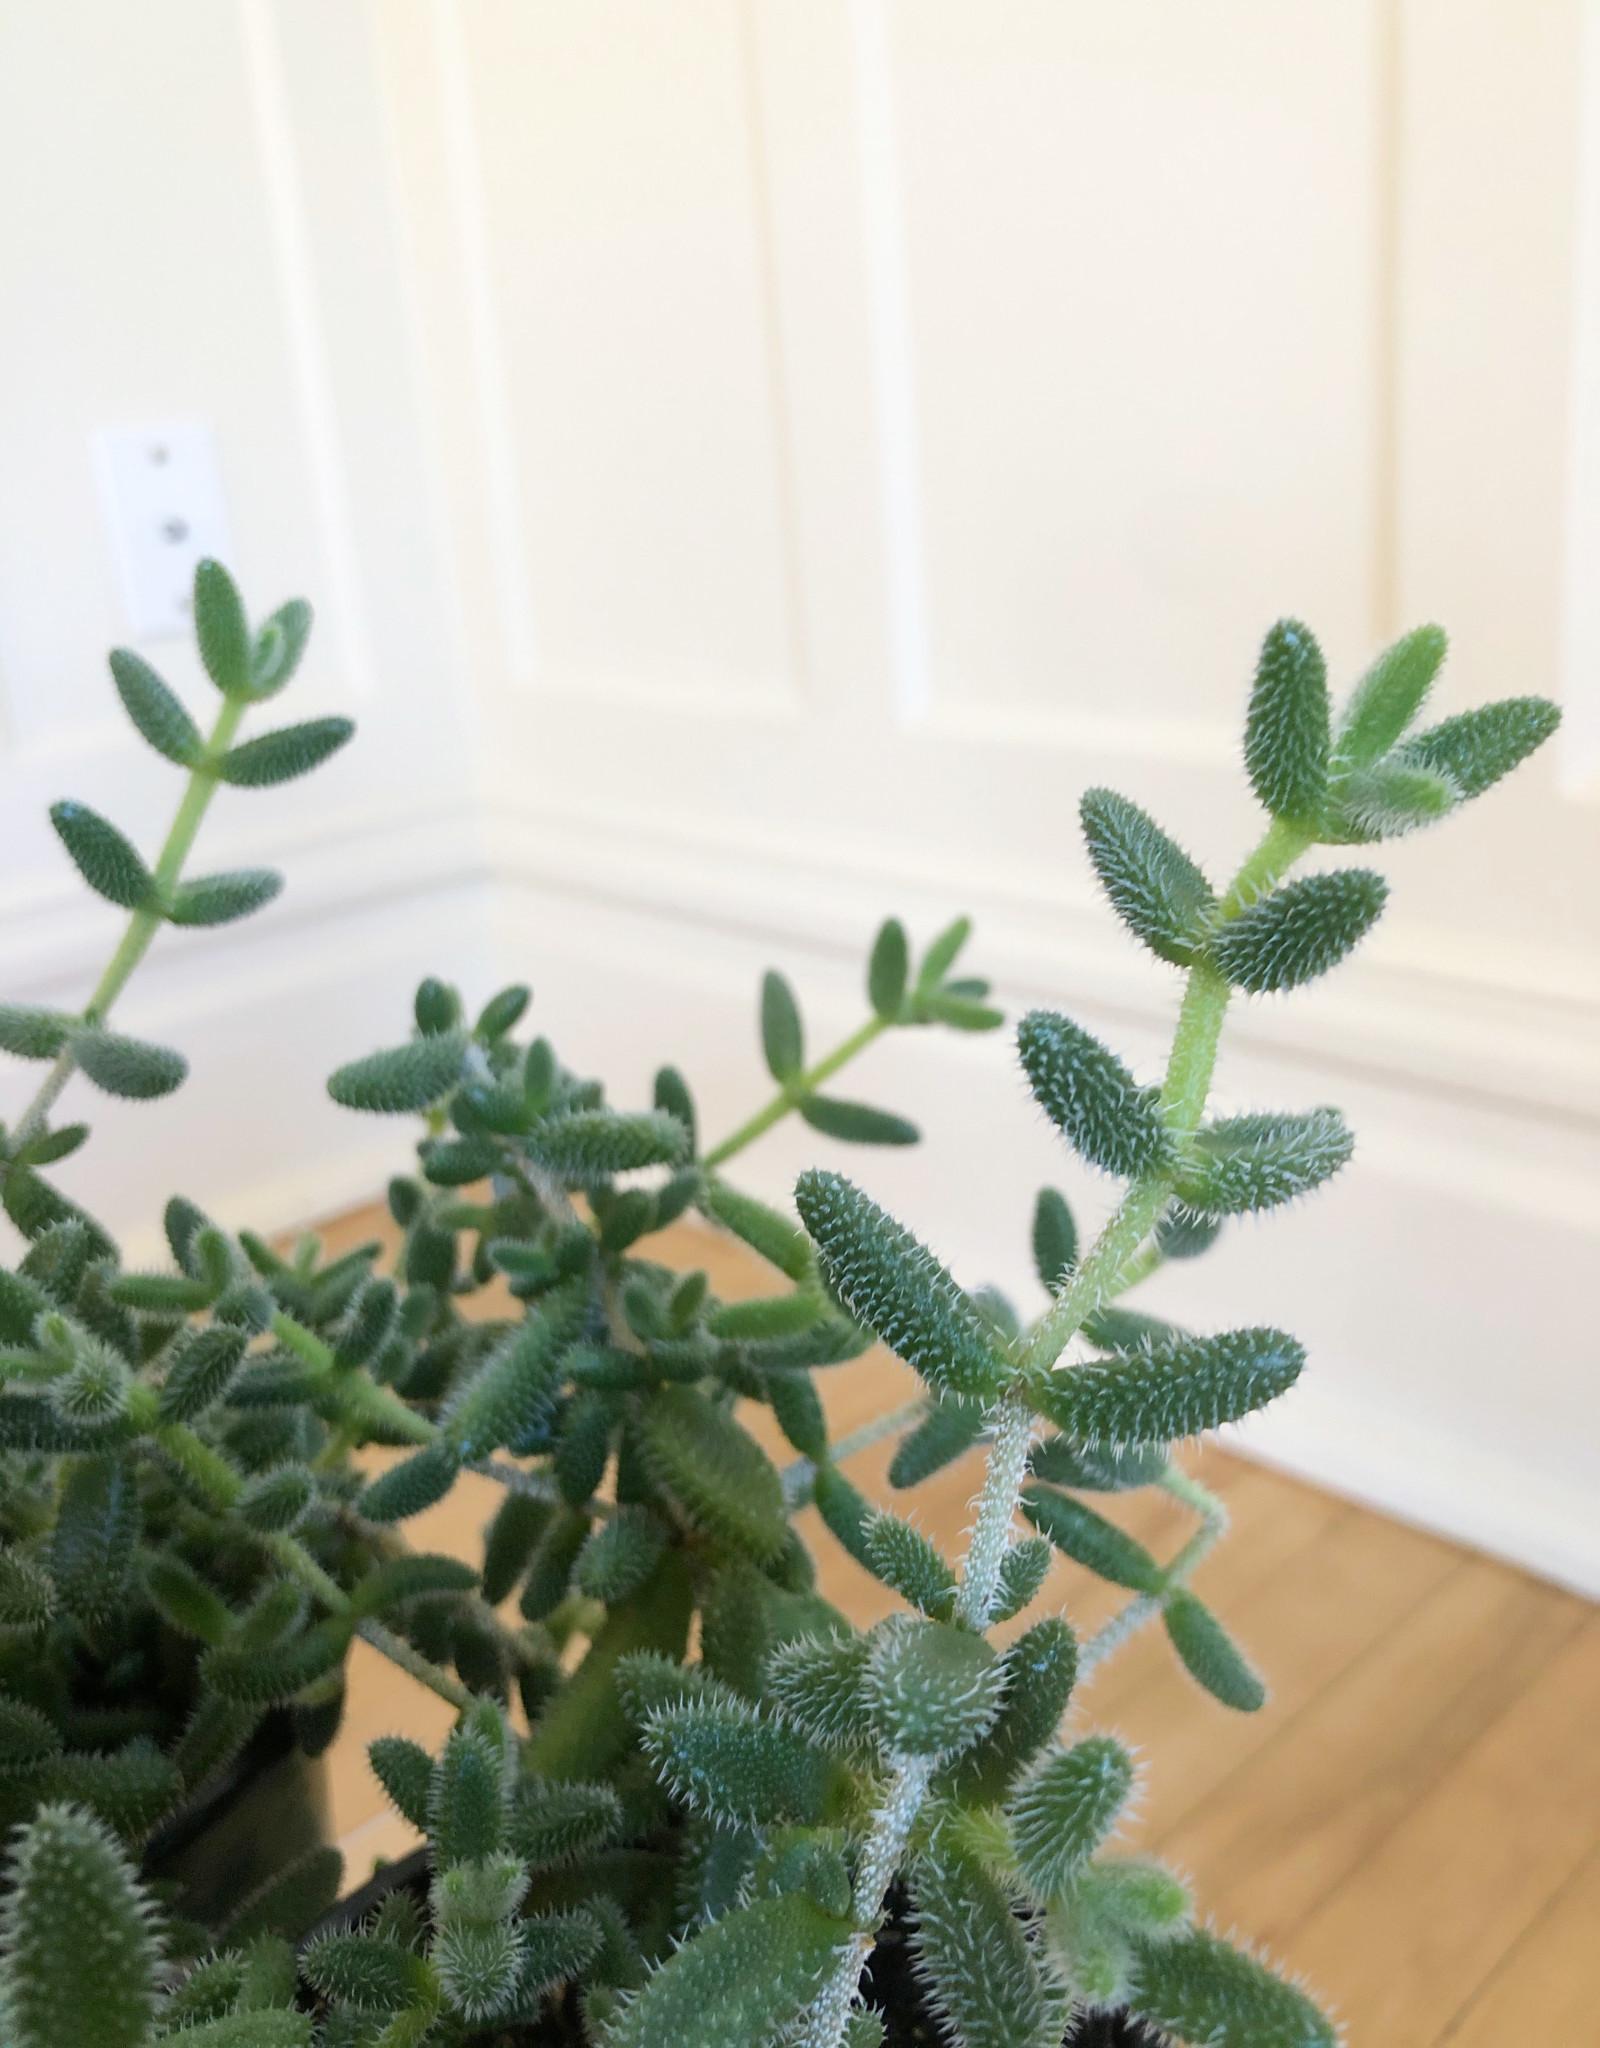 Curio Delosperma Echinatum Pickle Plant